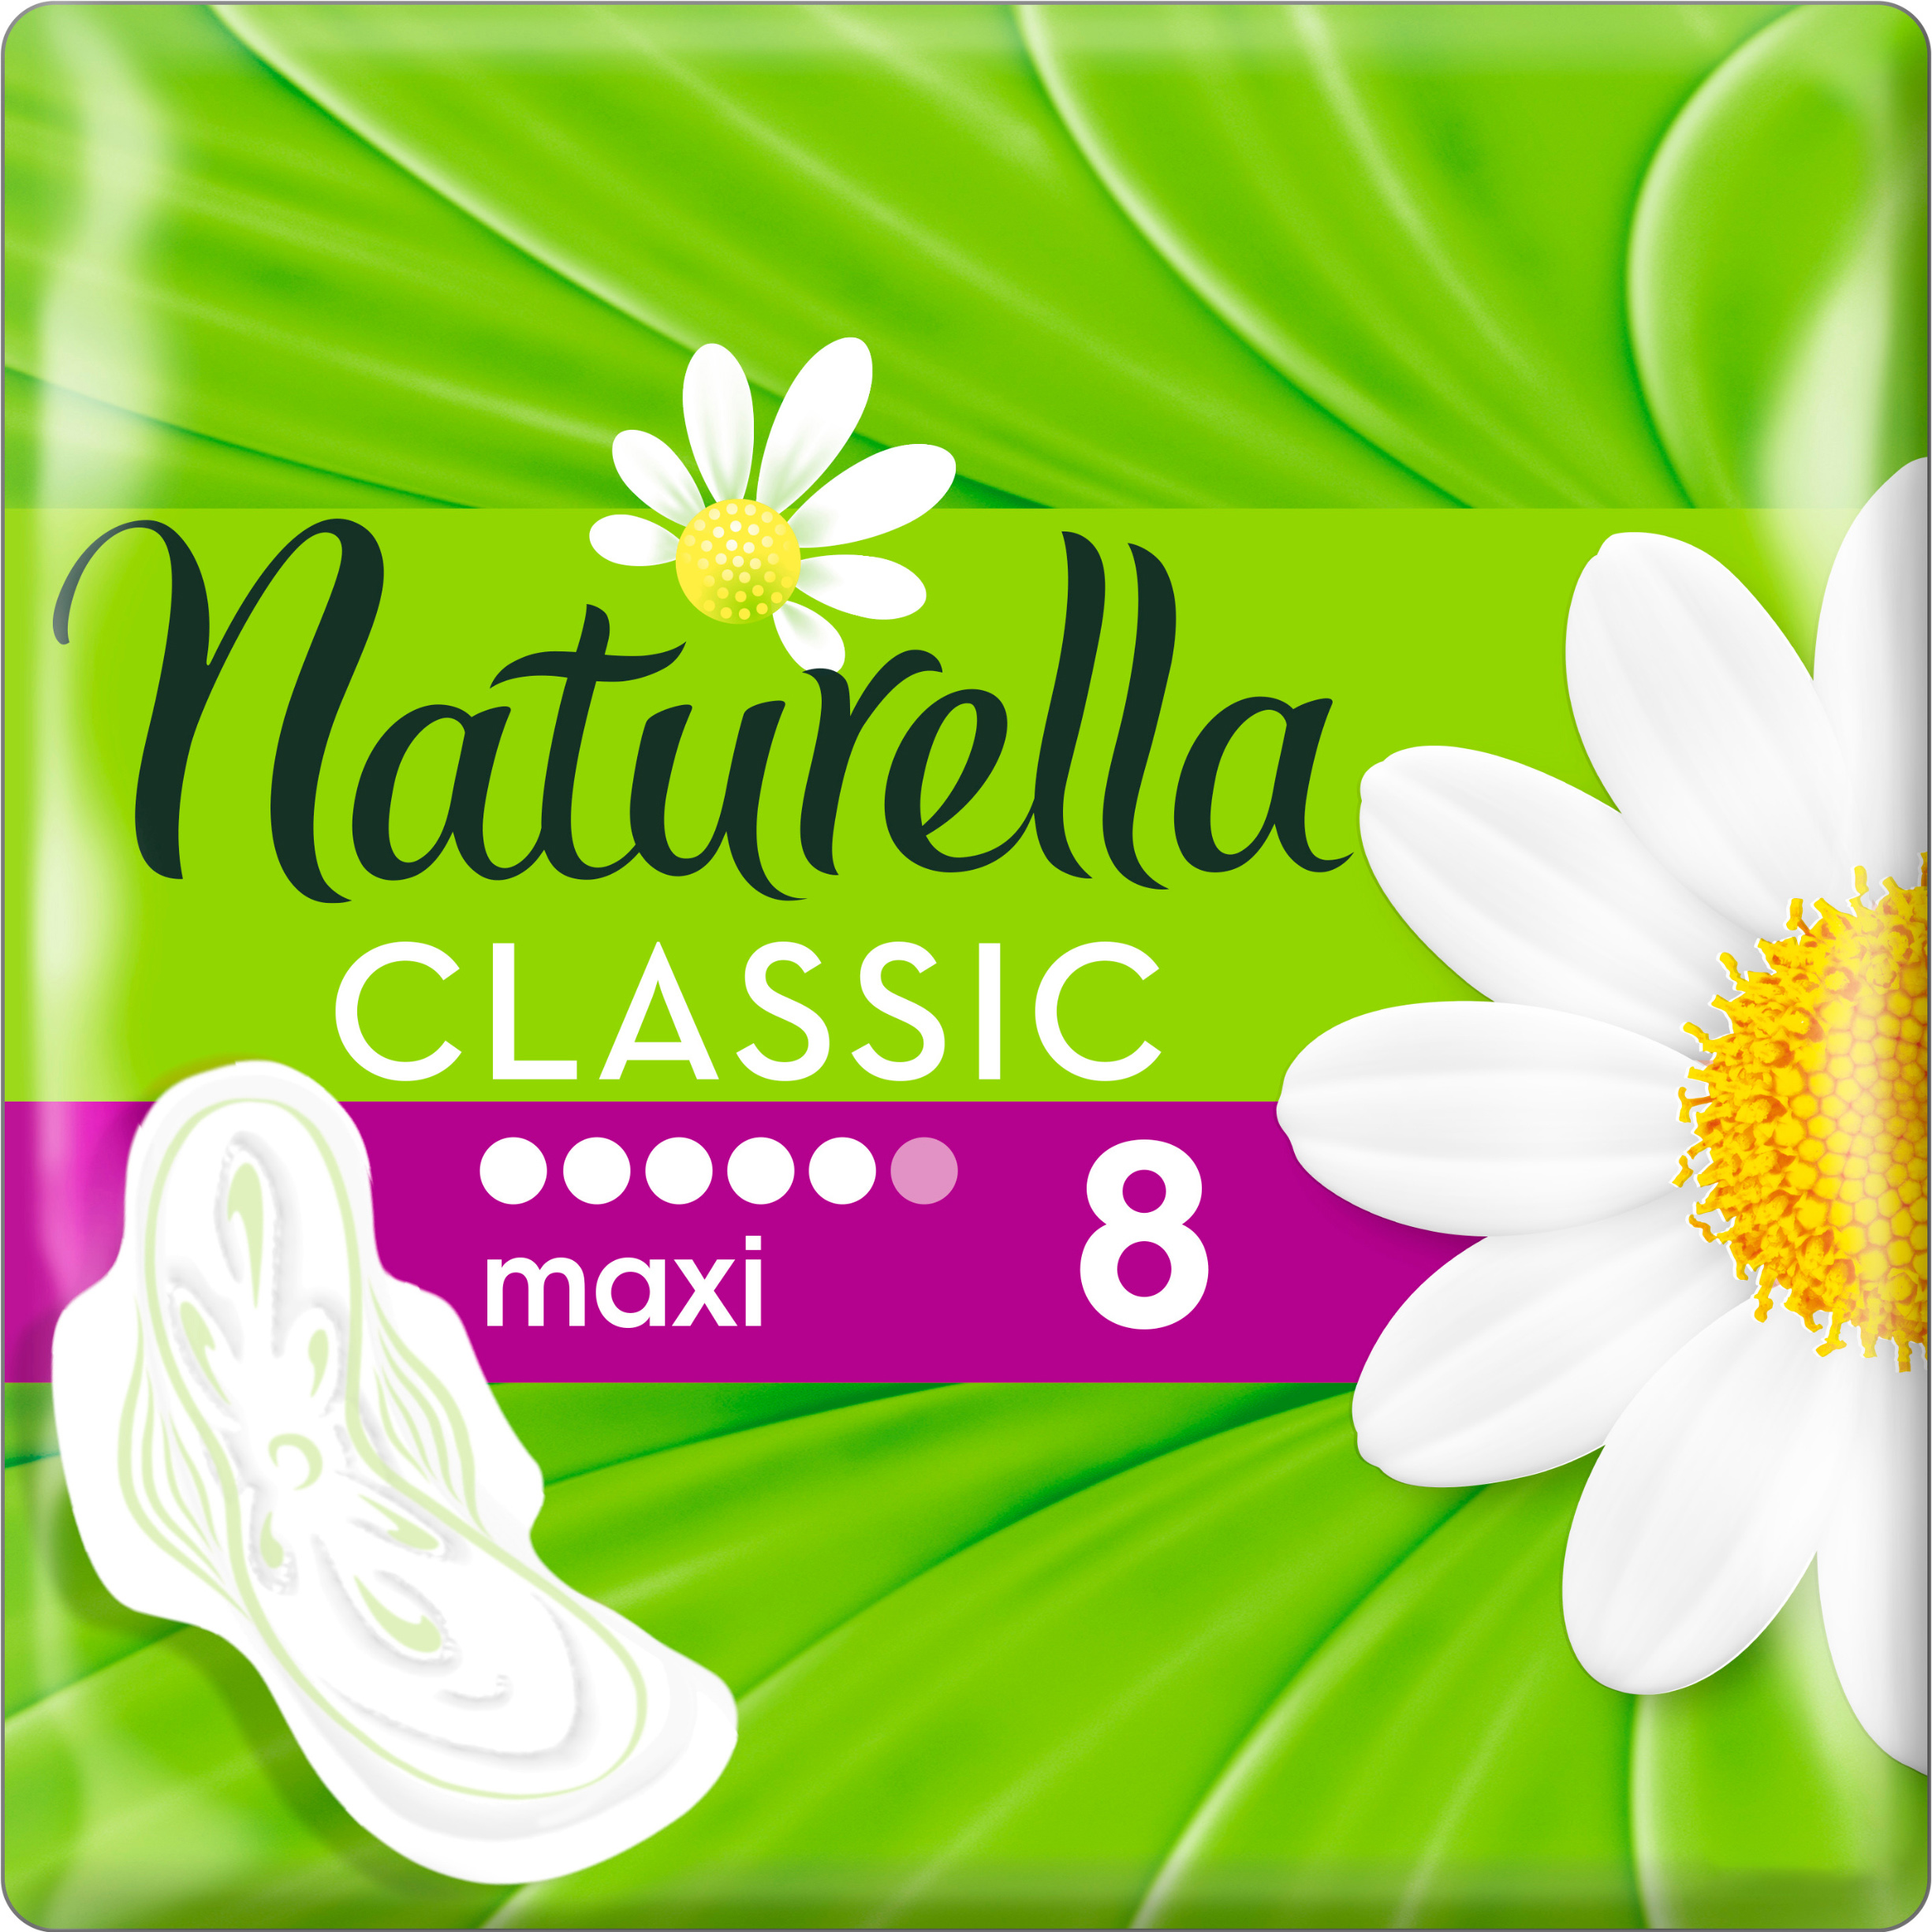 Прокладки Naturella Camomile Classic Maxi 8 шт прокладки naturella classic maxi duo 14шт